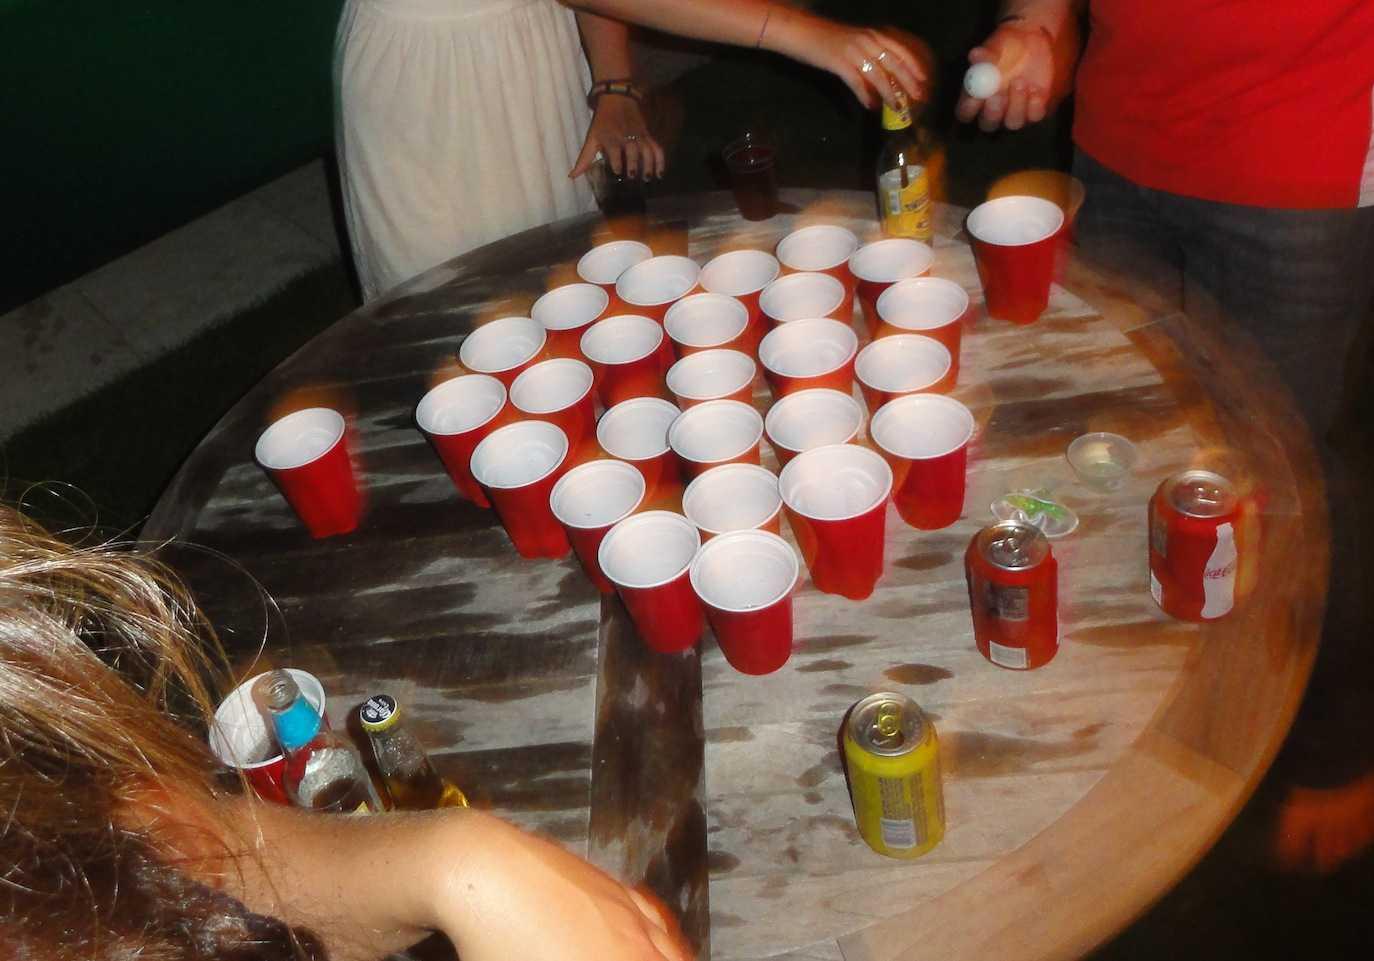 Top 10 Best Drinking Games Ohtopten